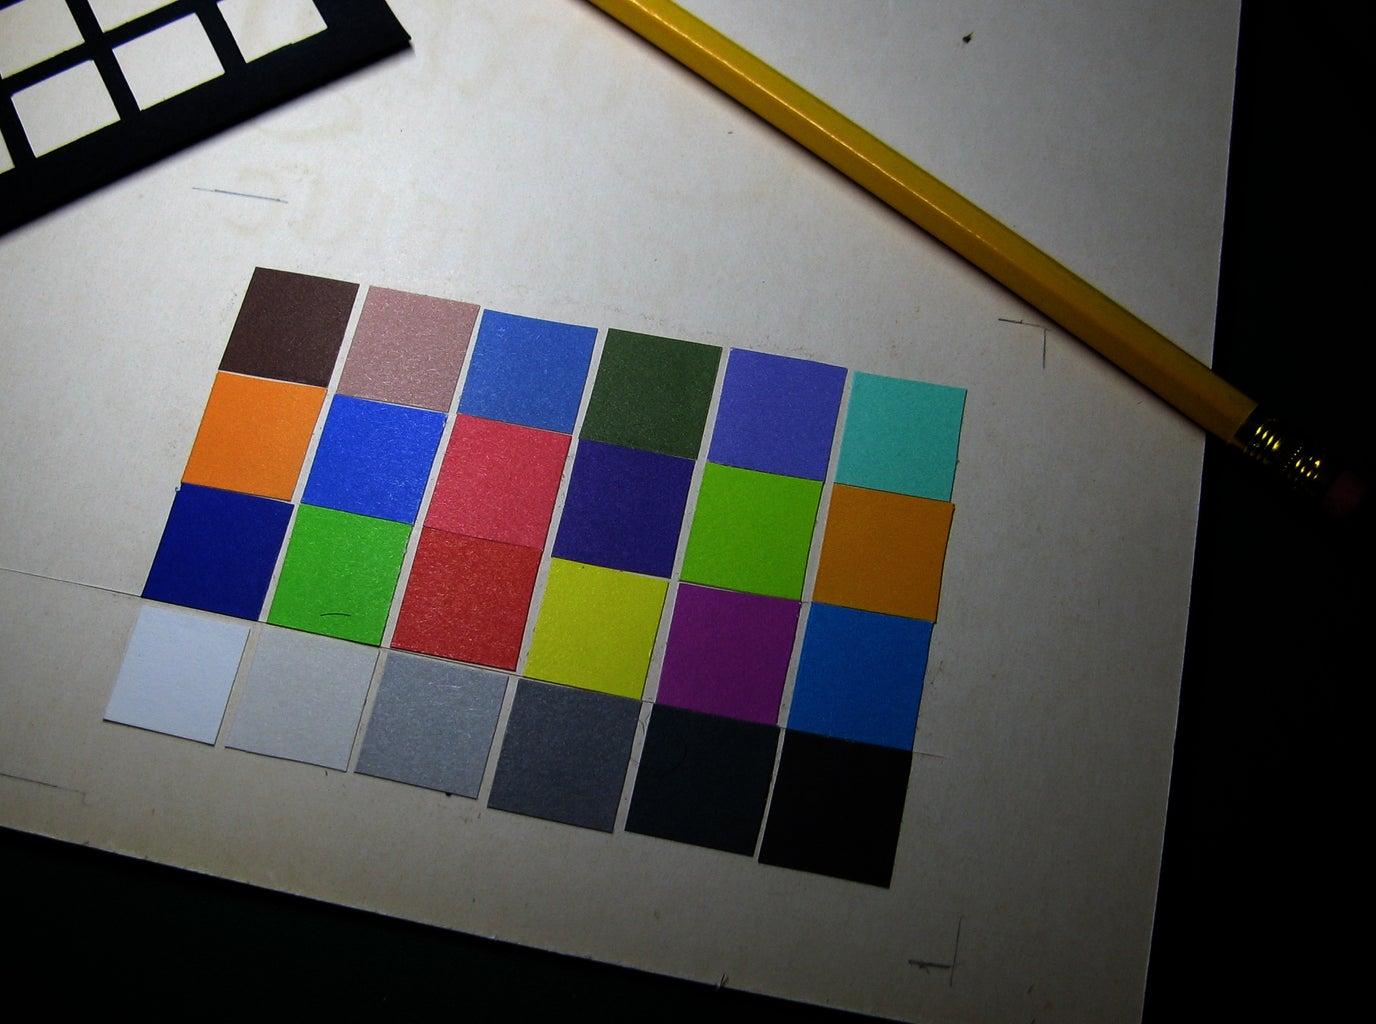 Stick Down the Color Squares